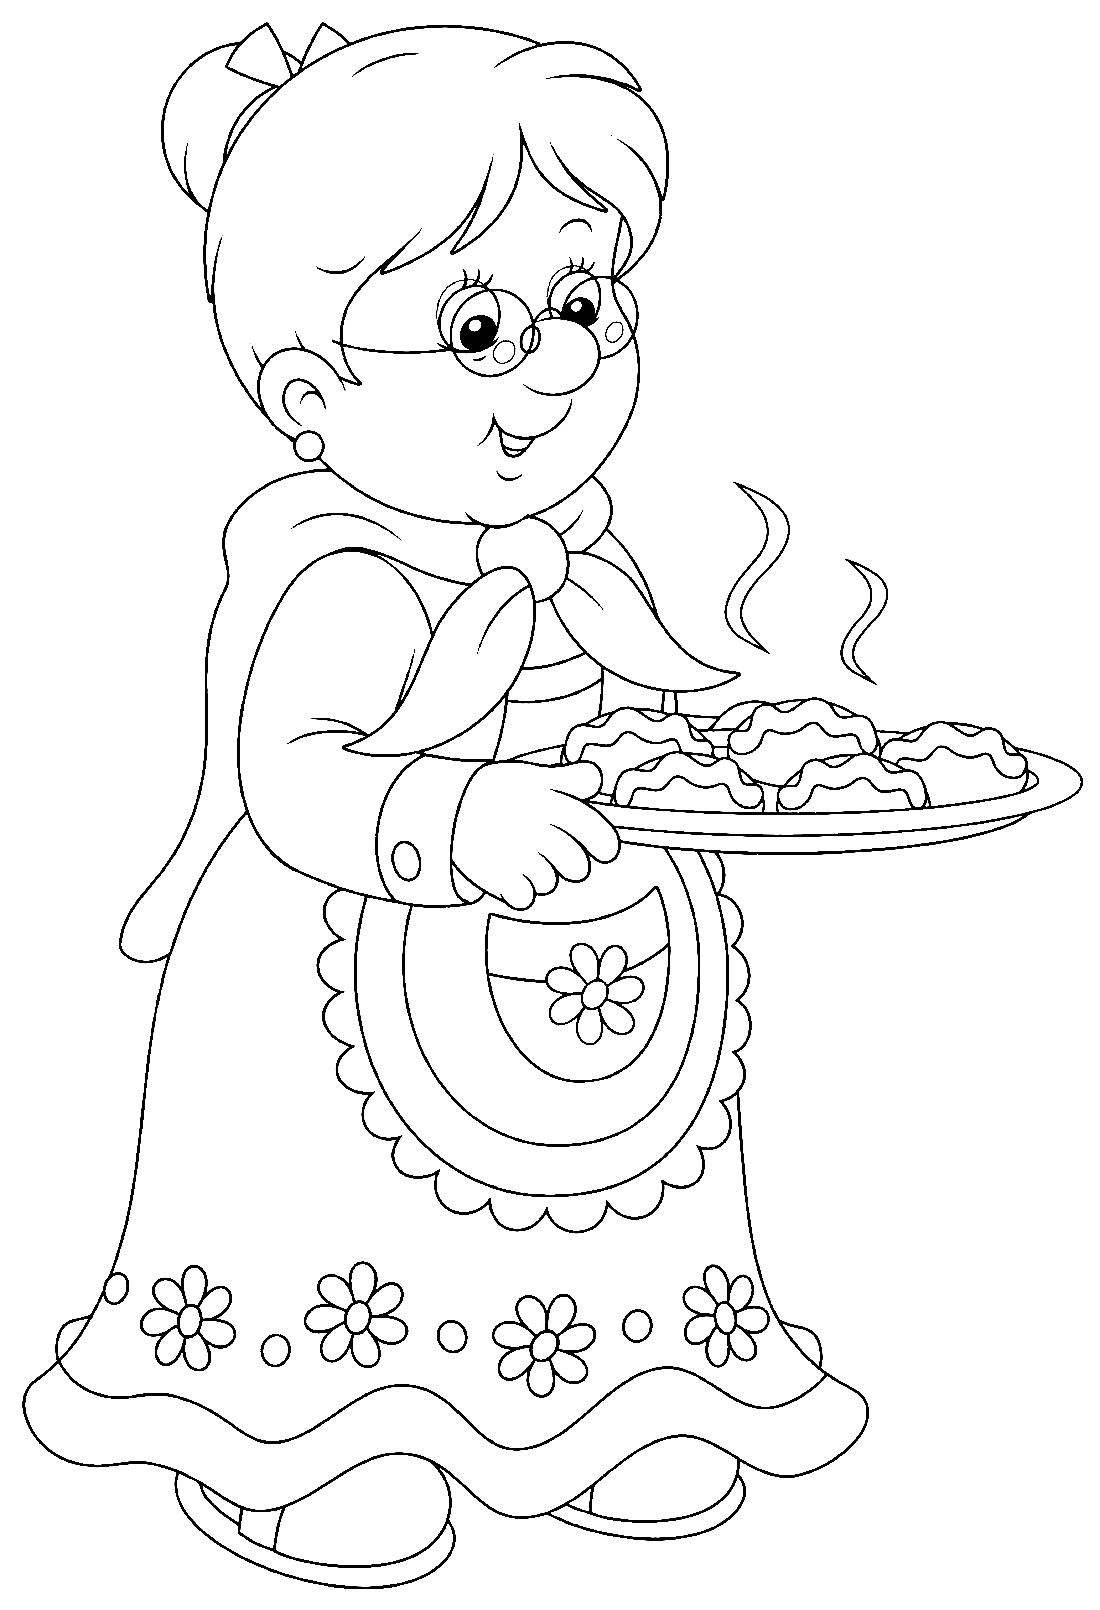 раскраски - Бабушка                               Интересные раскраски Бабушки. Раскраски для детей. Бабушка. Раскраски человек, раскраски бабушка.  раскраски с бабушкой и внуками.